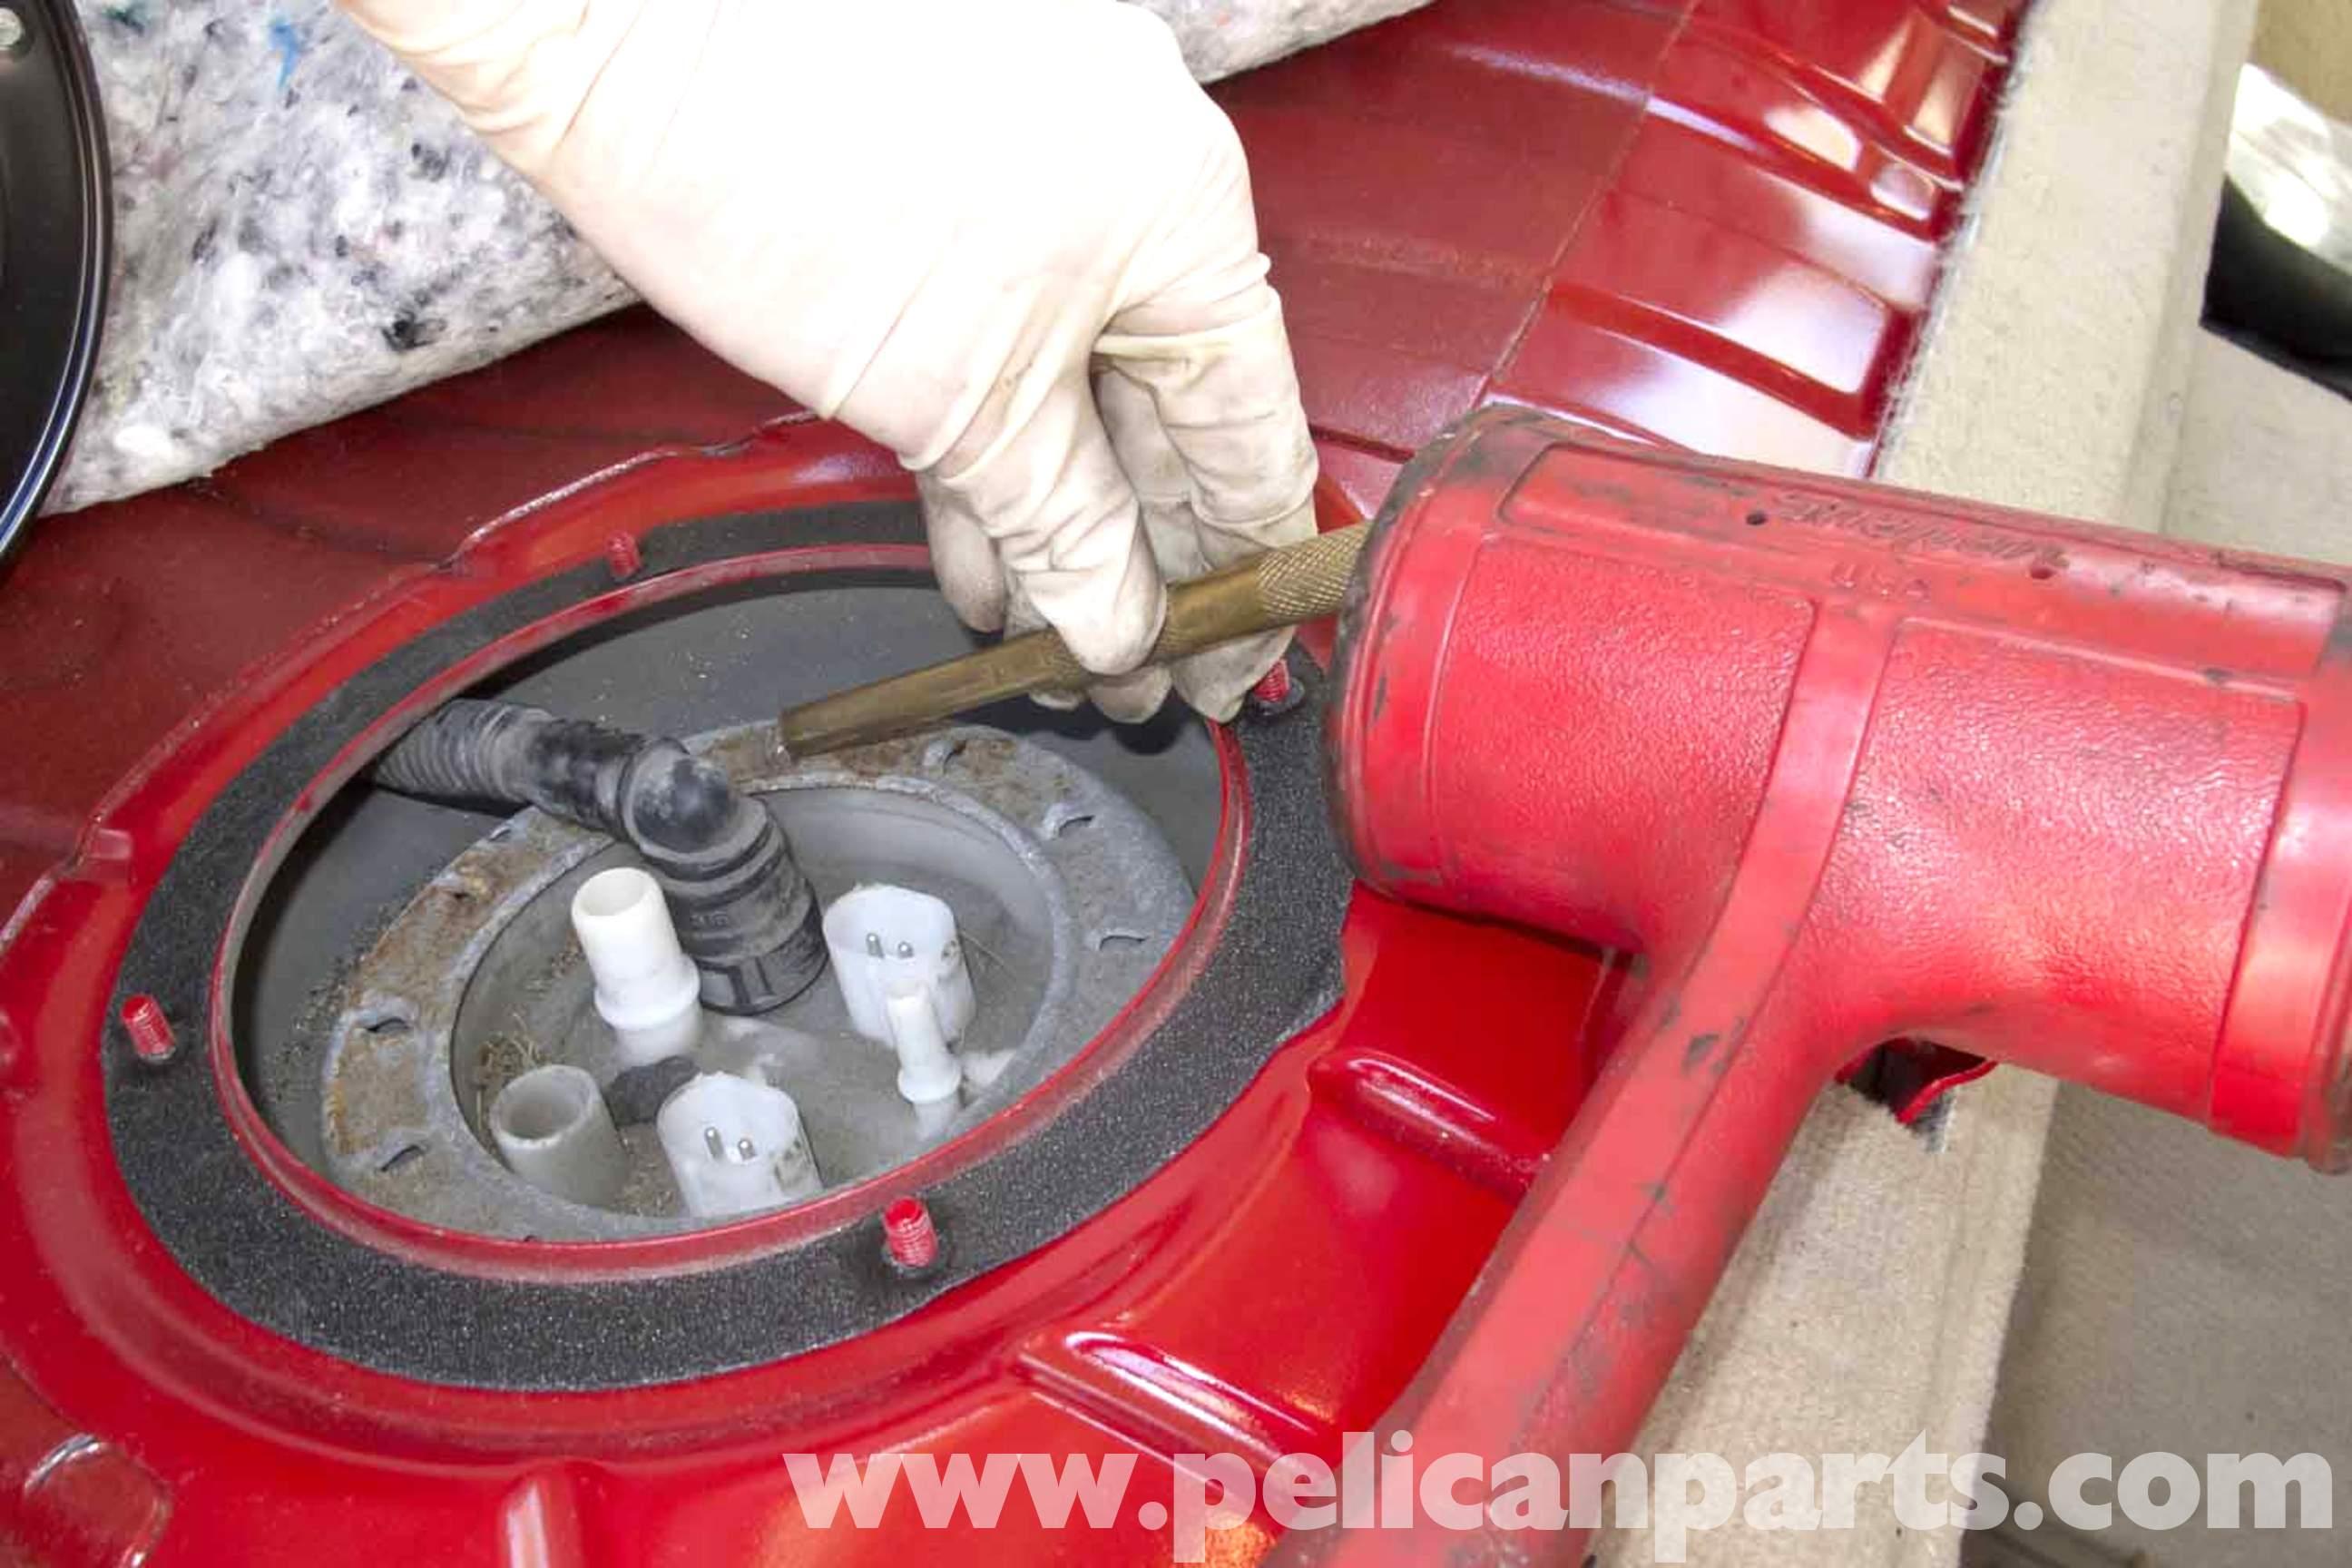 BMW E90 Fuel Pump Replacement | E91, E92, E93 | Pelican